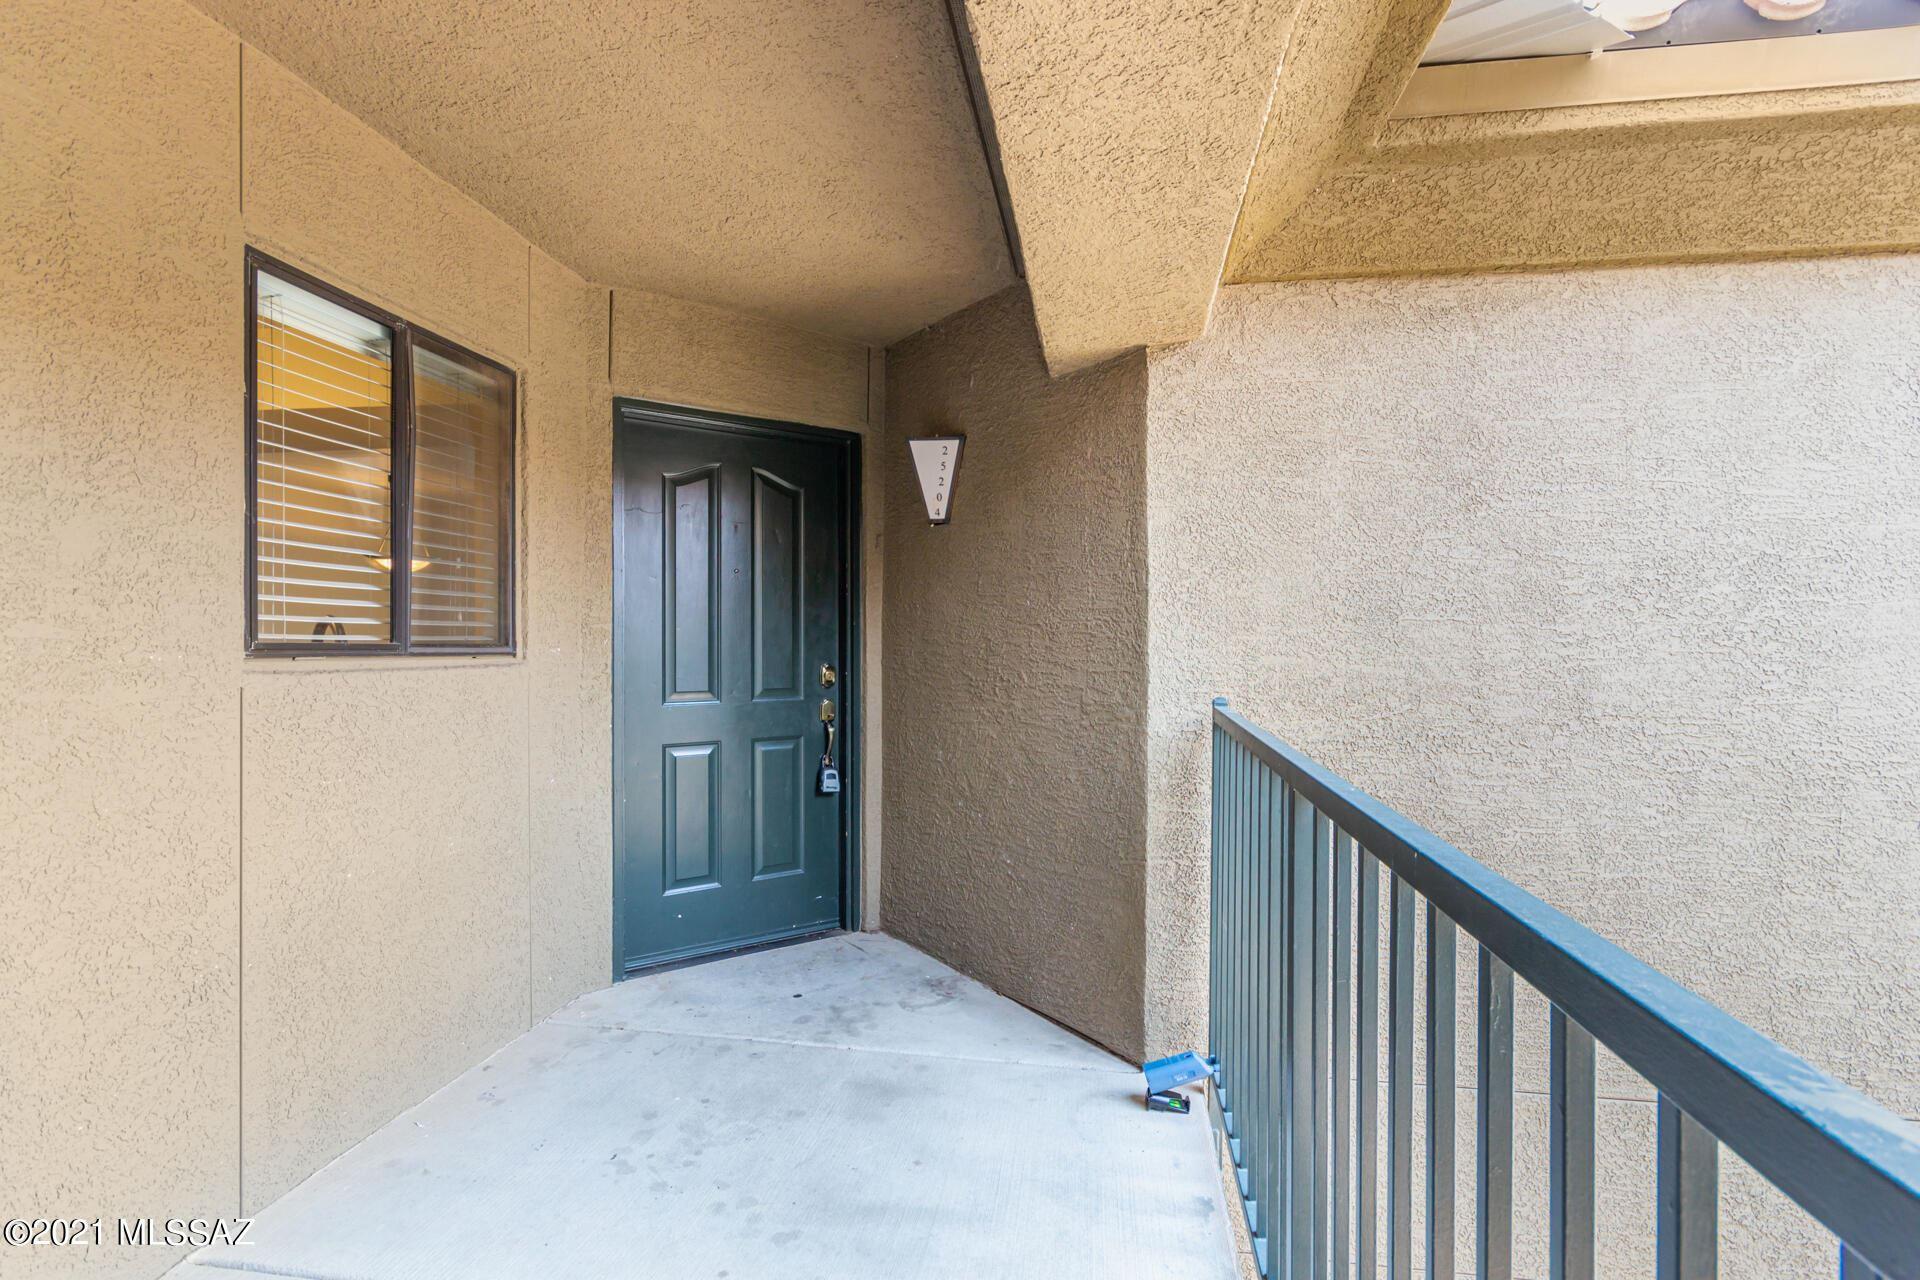 5751 N Kolb Road #25204, Tucson, AZ 85750 - MLS#: 22118194